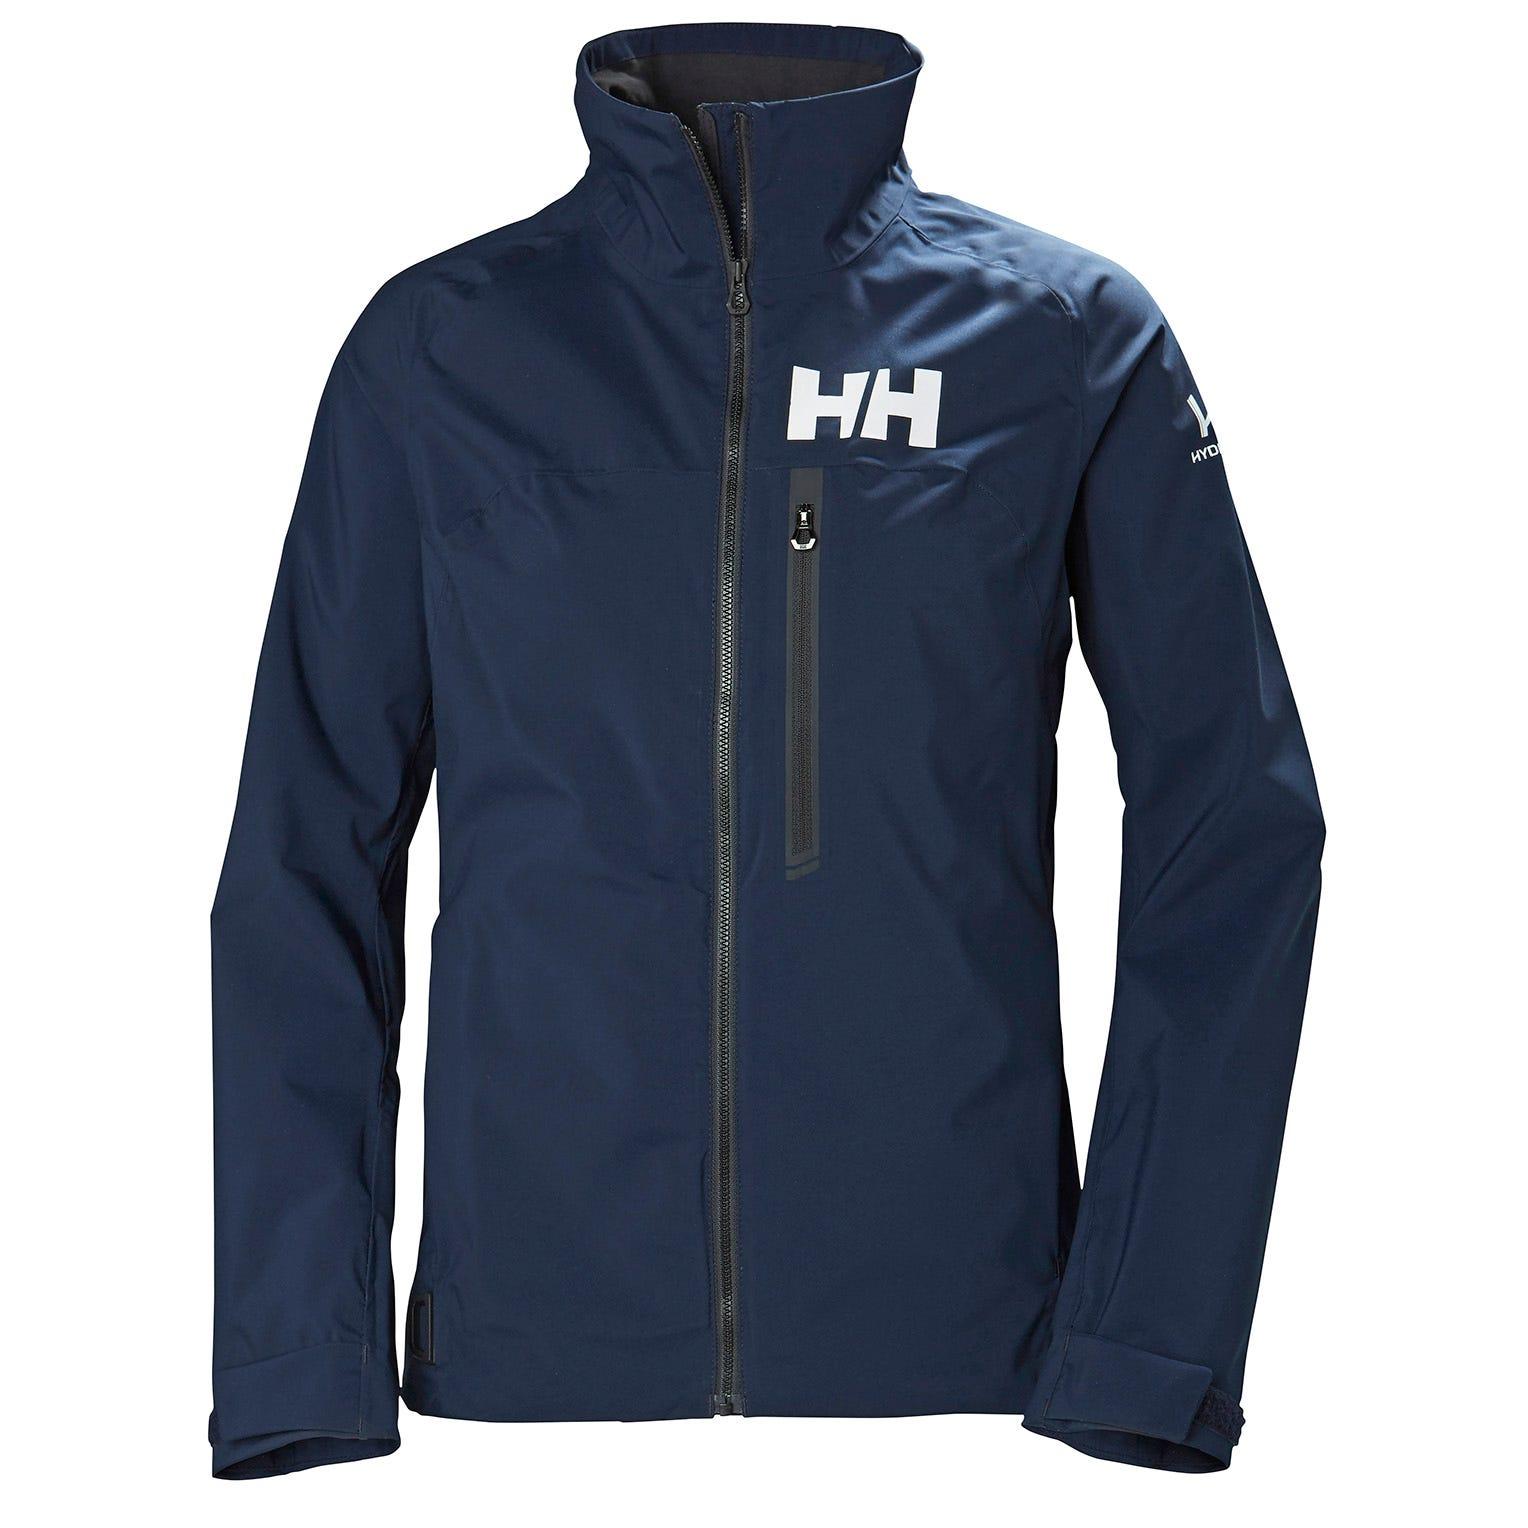 Helly Hansen Womens Hp Racing Sailing Jacket Navy S